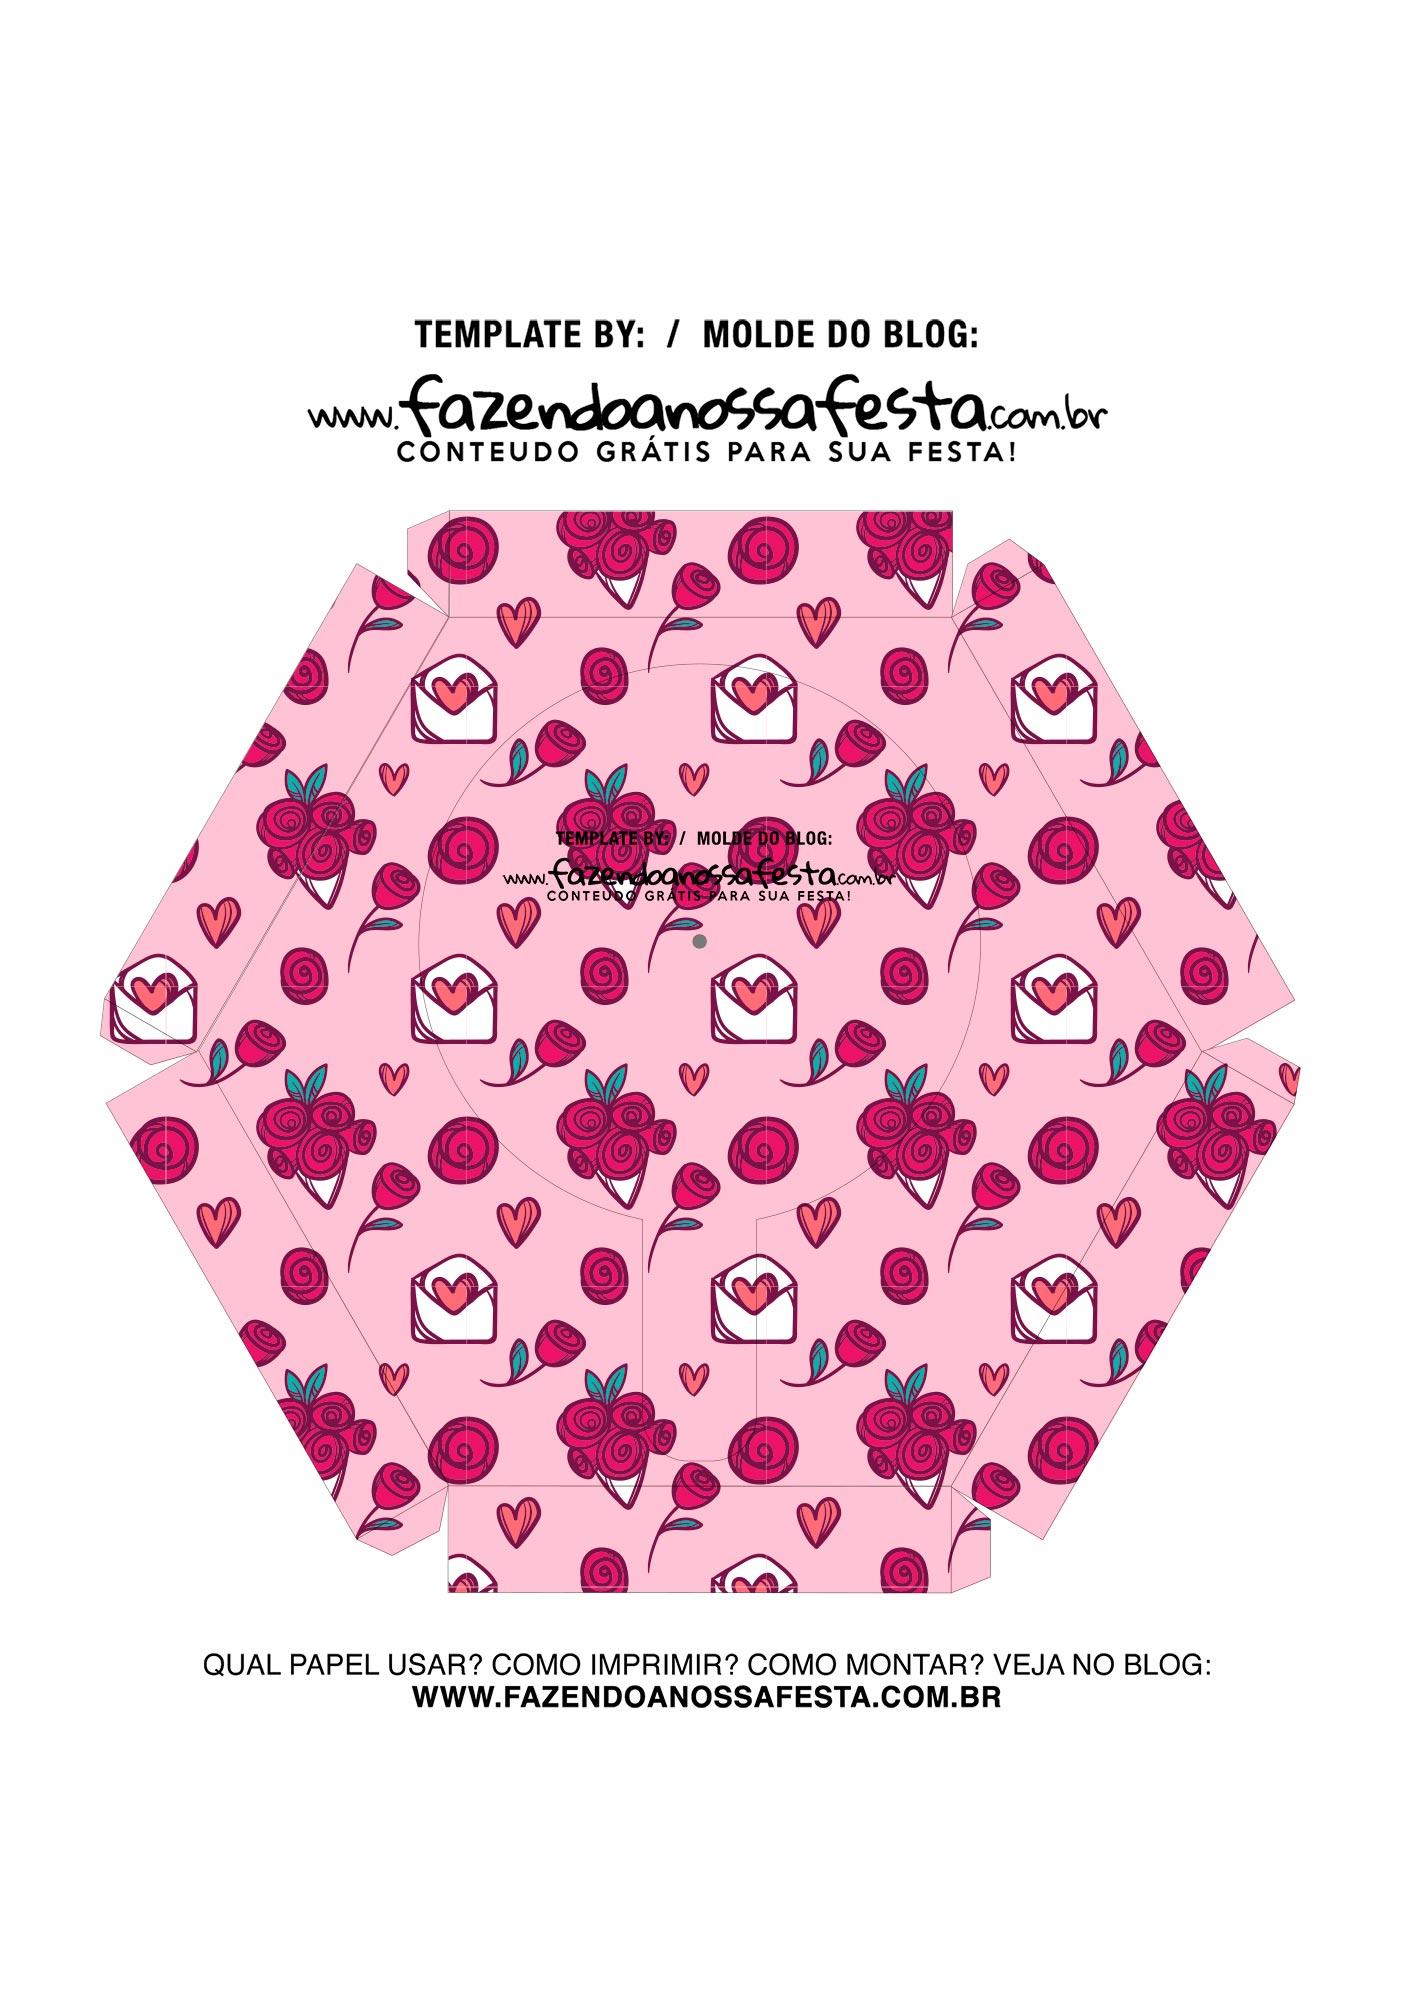 Caixa Explosiva Dia dos Namorados Rosa Coracoes 7